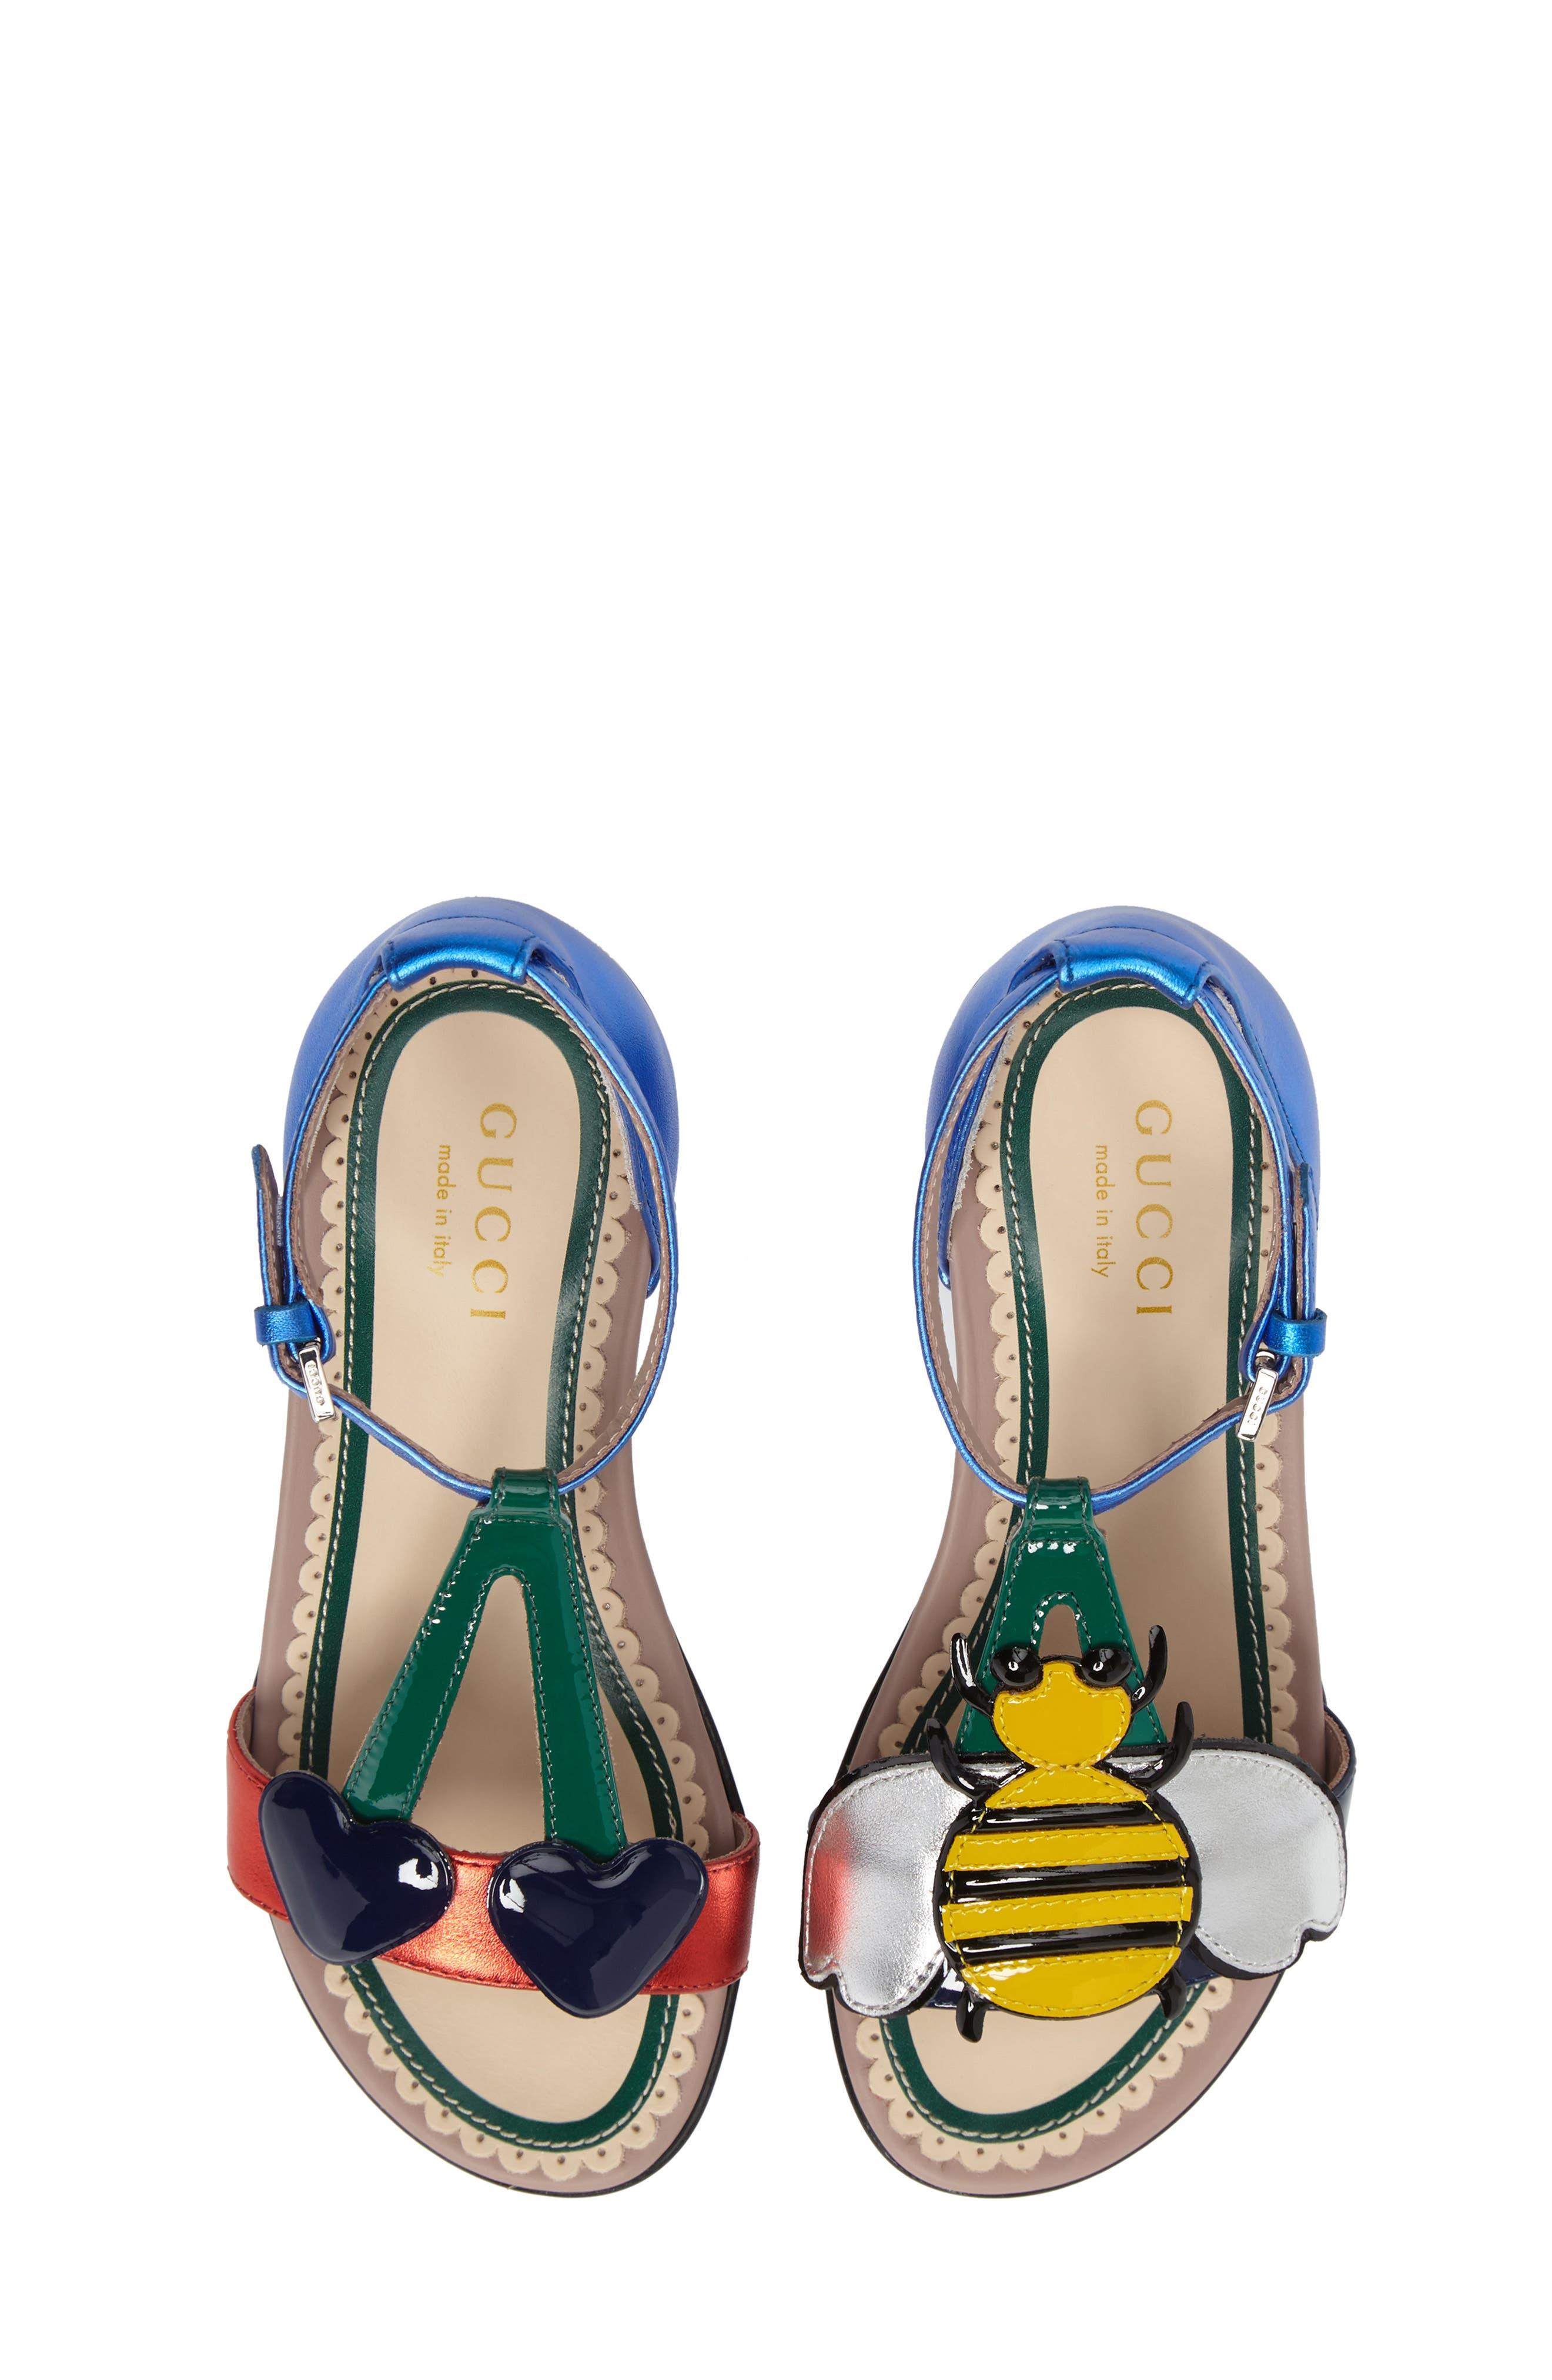 Gucci Bee Cerise Sandal (Toddler & Little Kid)